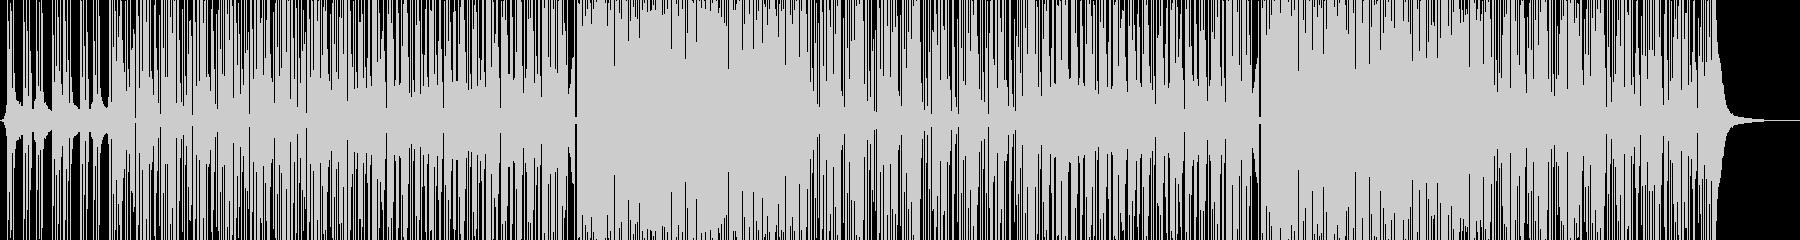 EDM=ナチュラル・爽やか★ポップハウスの未再生の波形